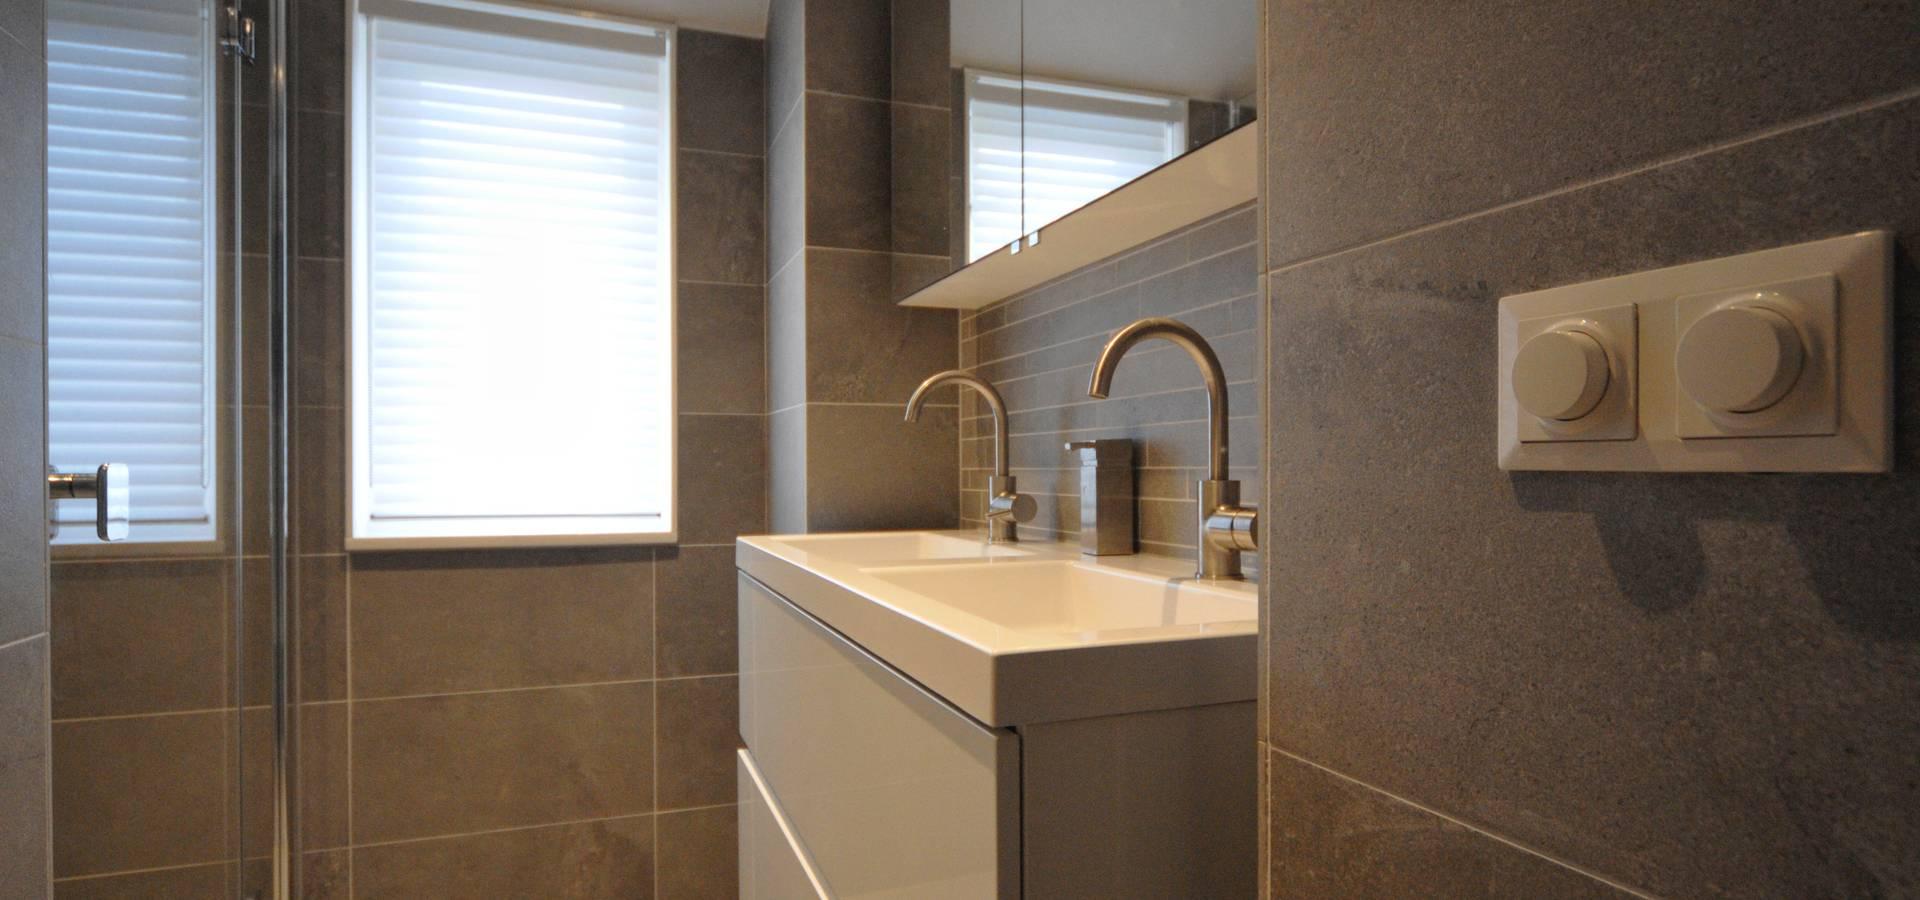 Stijlvolle kleine badkamer in Amsterdam von AGZ badkamers en ...